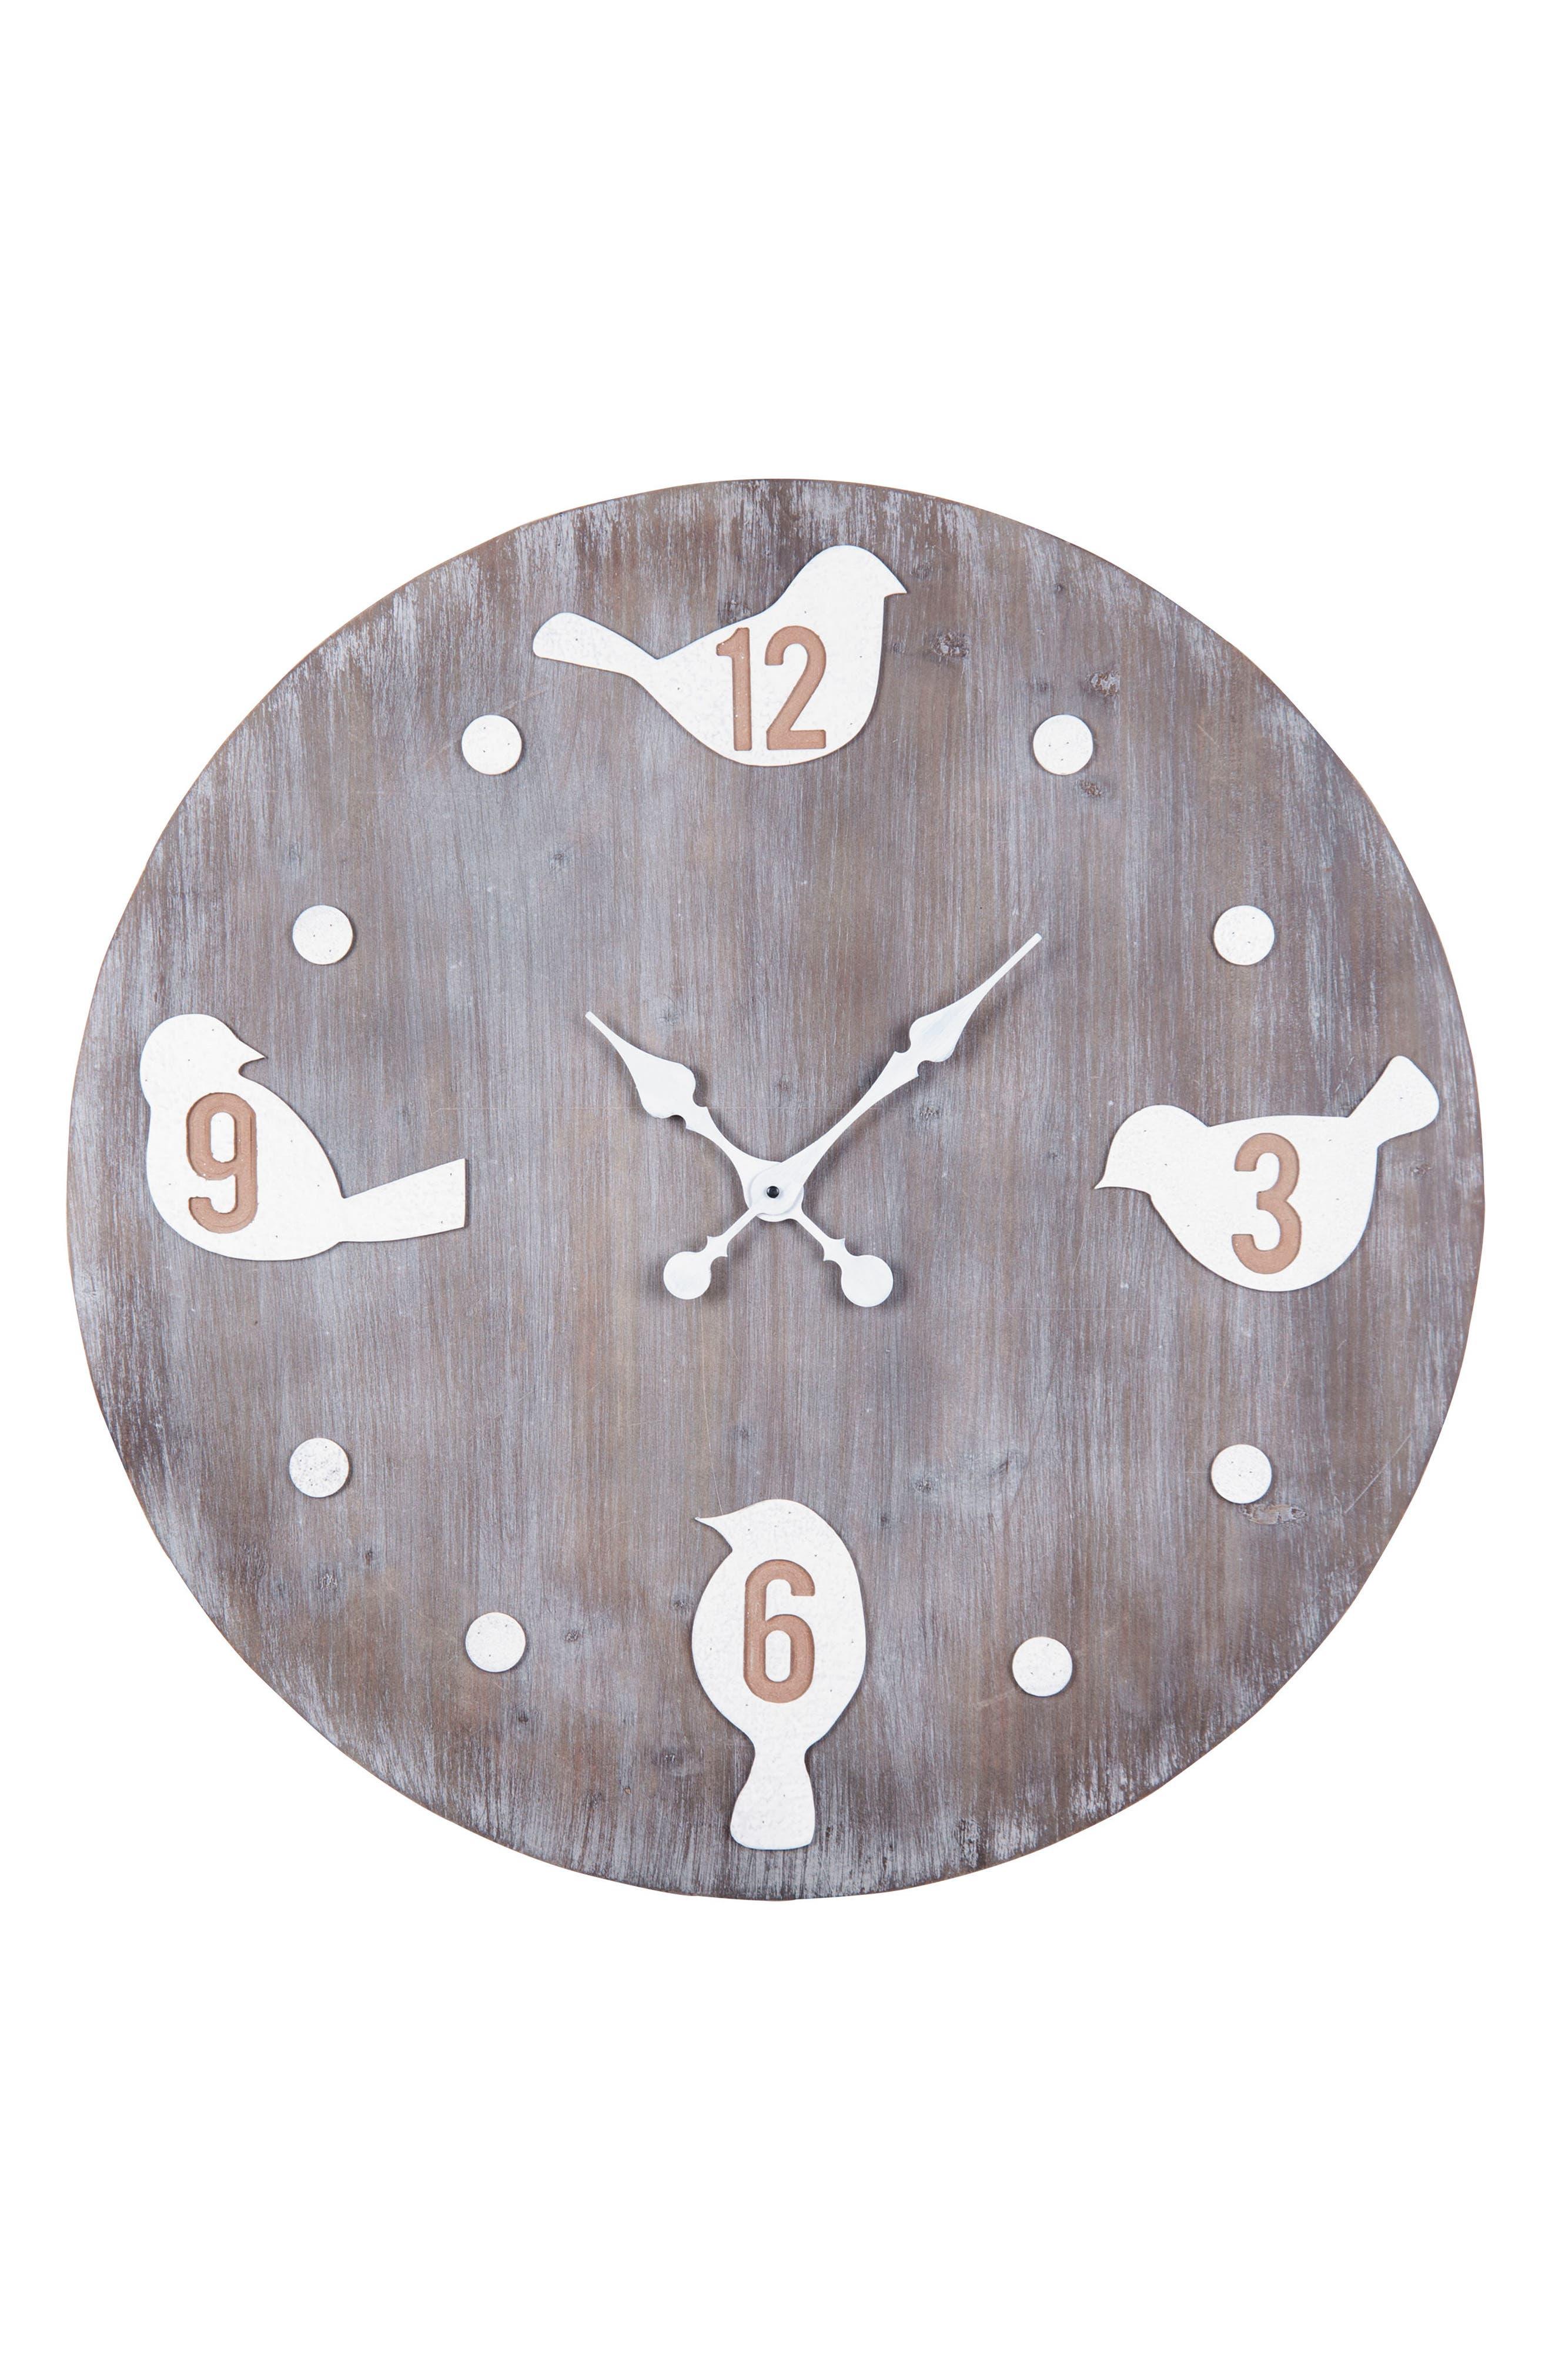 Bird Wall Clock,                             Main thumbnail 1, color,                             WOOD/ METAL